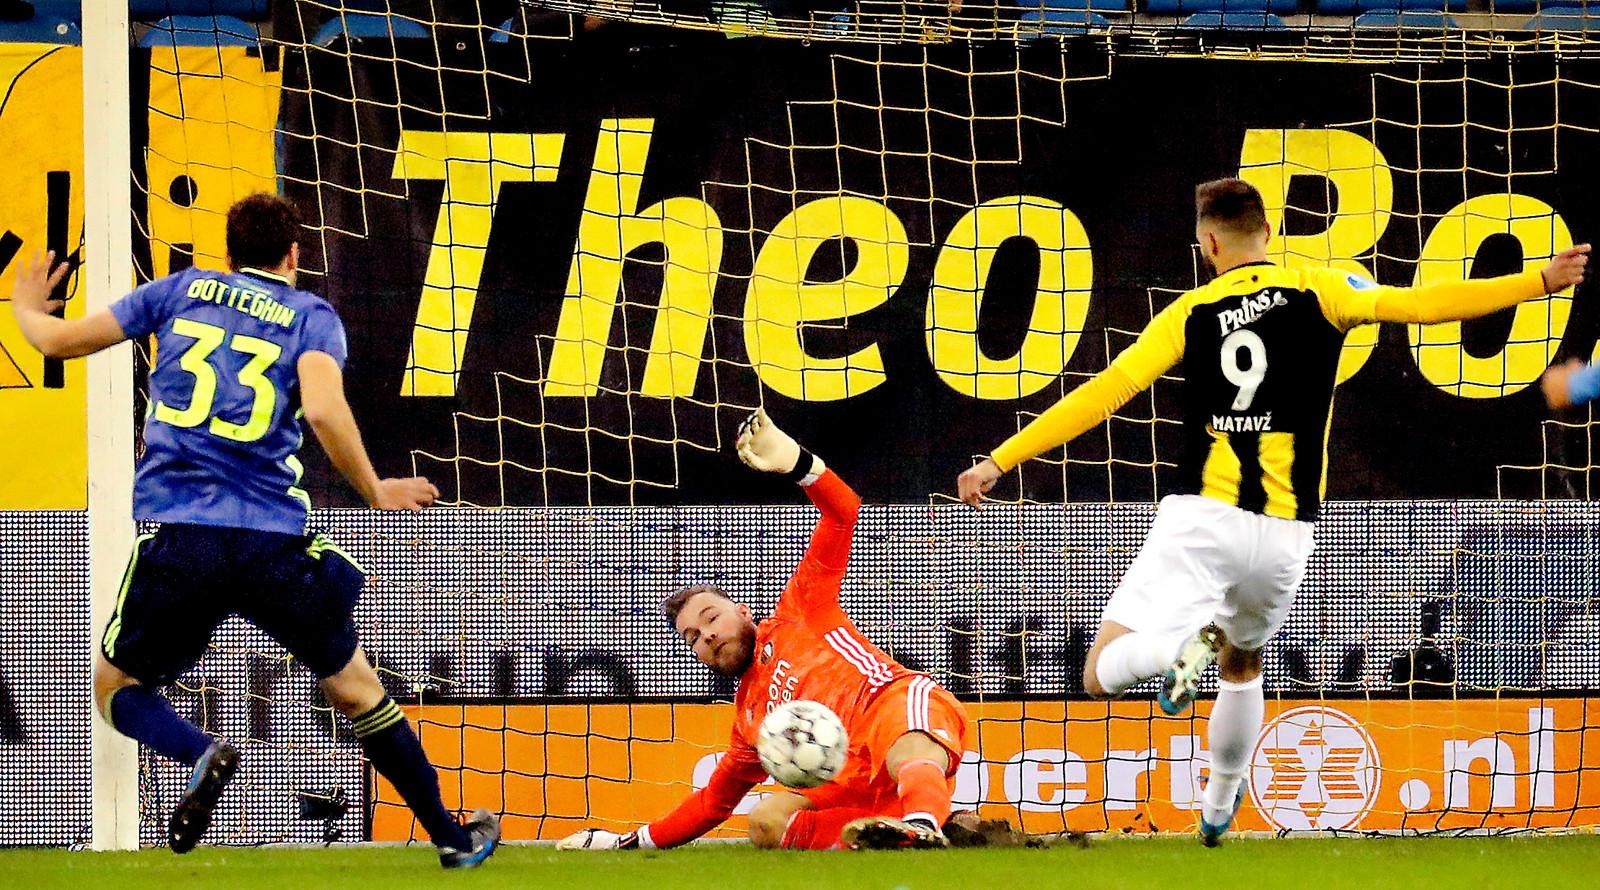 Nick Marsman (Feyenoord) stopt de penalty van Tim Matavz (Vitesse). Dit duel eindigde in 0-0.